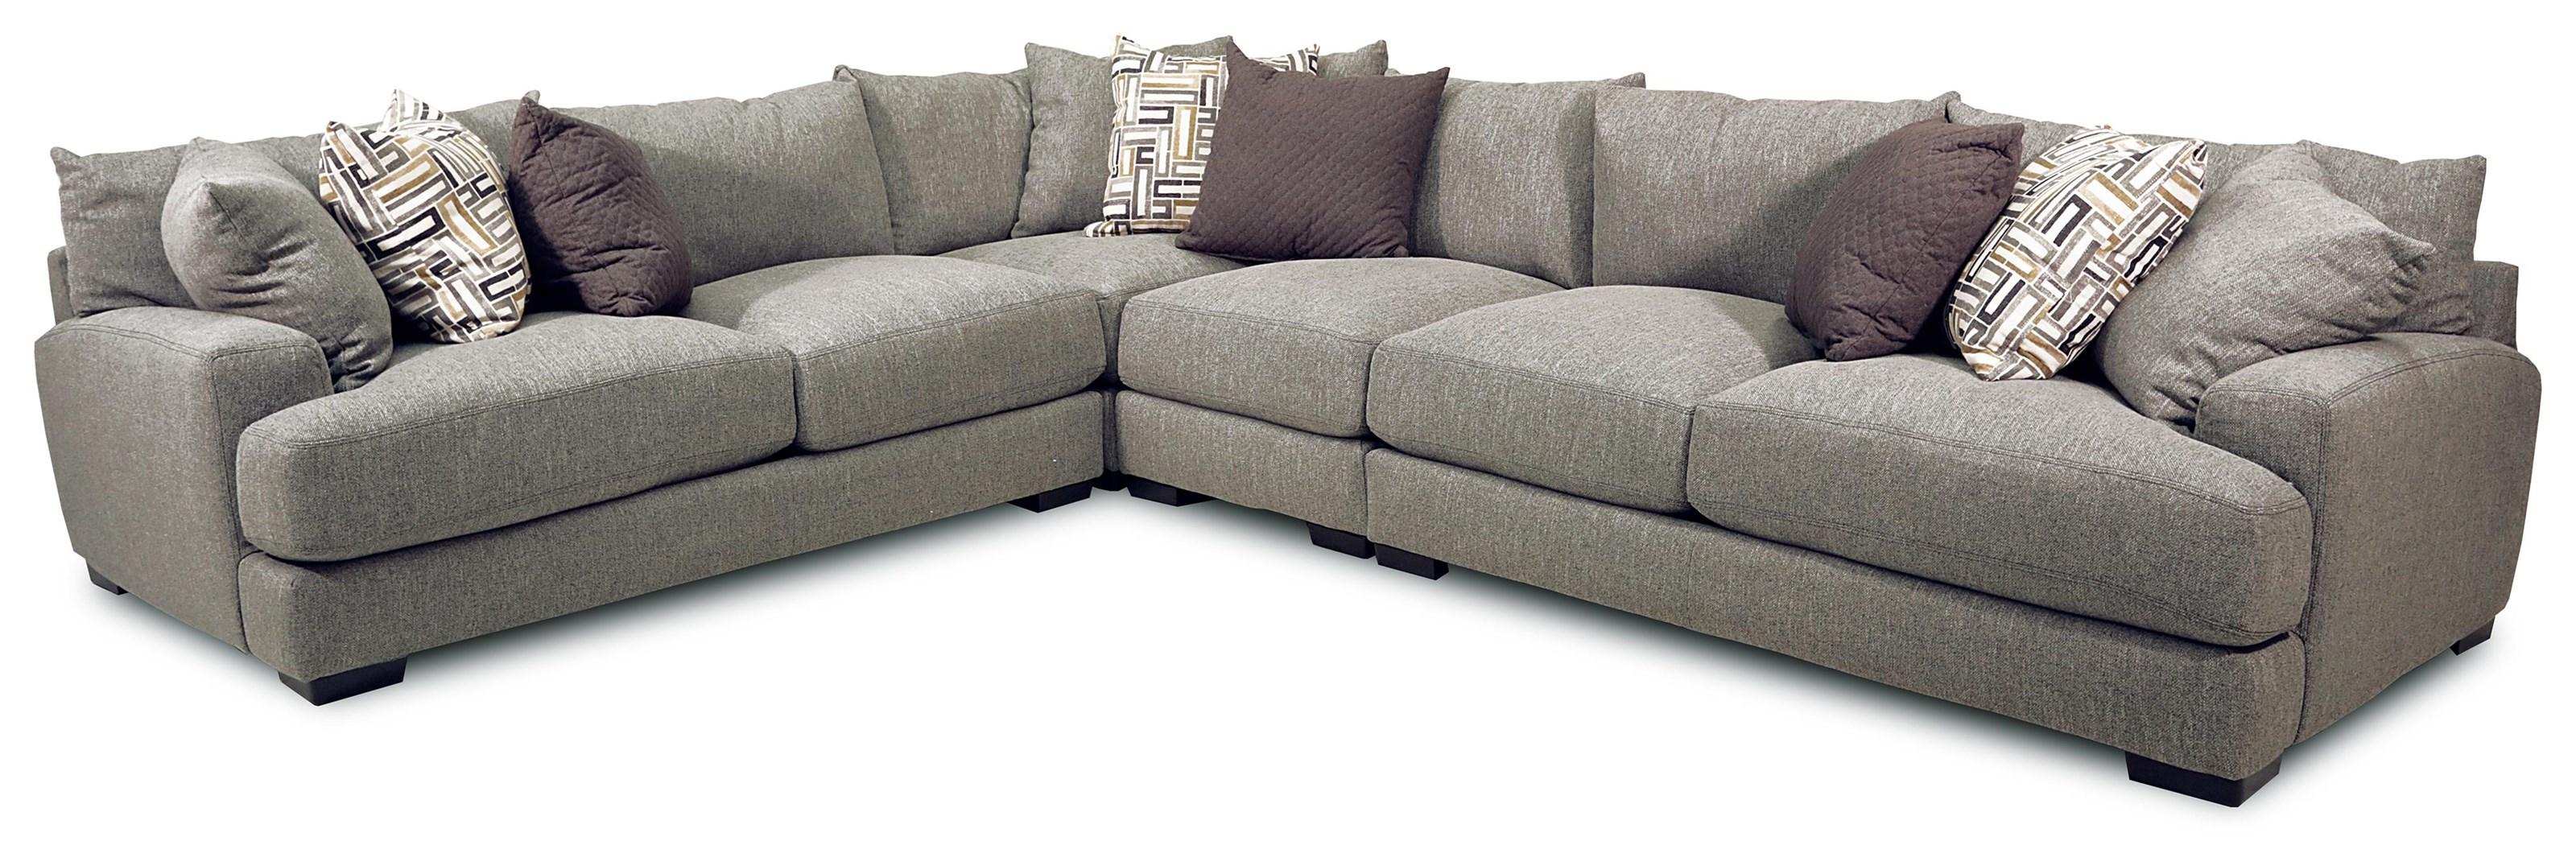 slumberland com sofas wesley hall sumter sofa franklin 4 pc sectional review home co